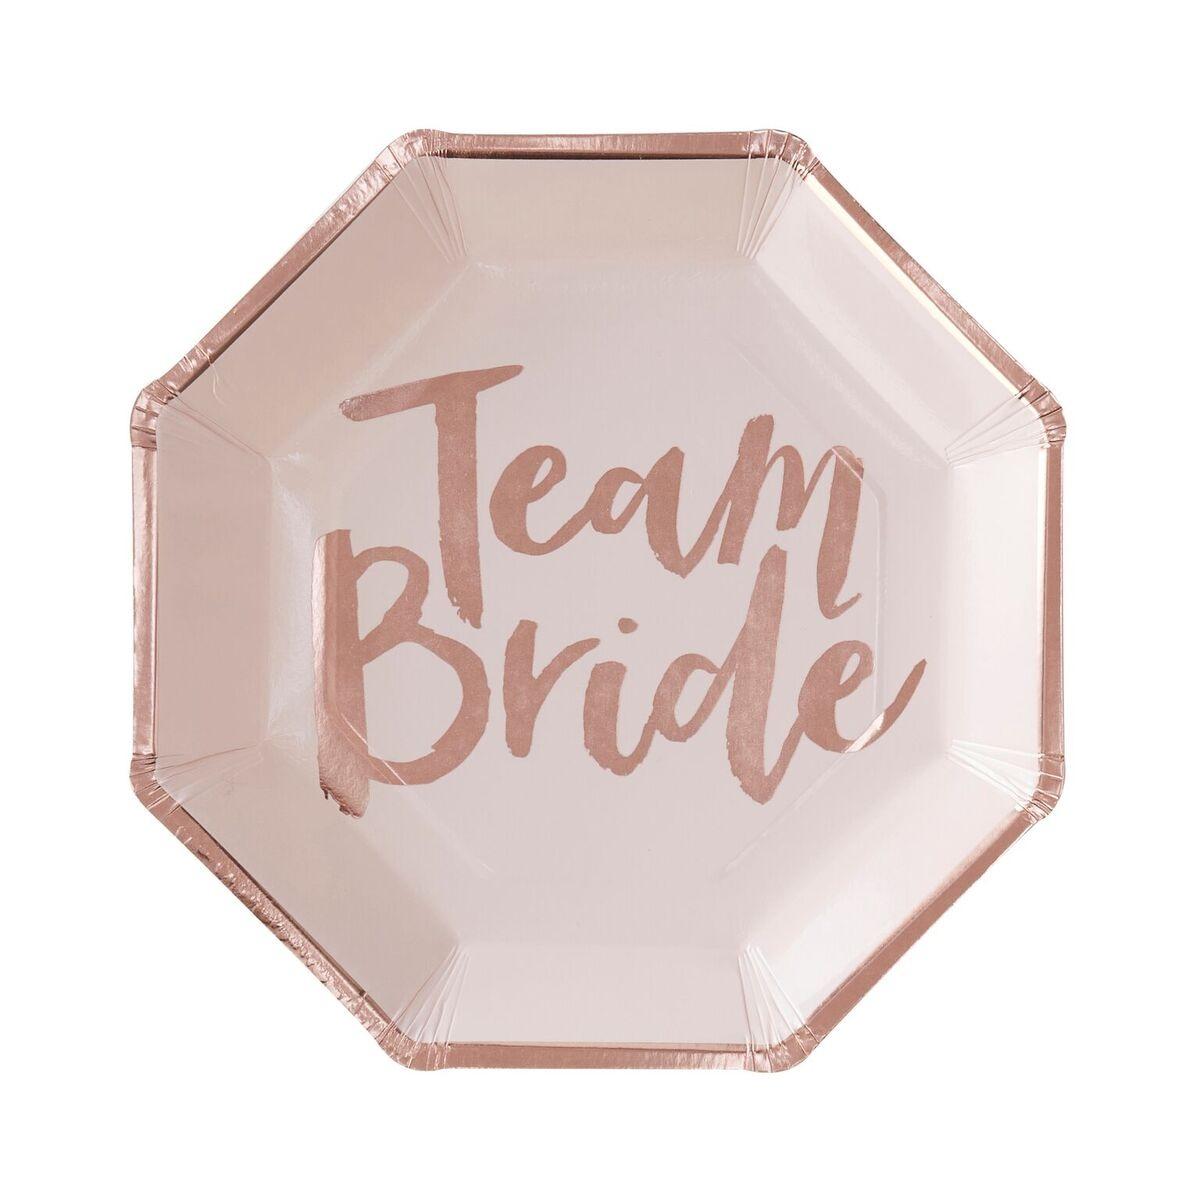 Rose Gold Foiled Team Bride Paper Plates 10941